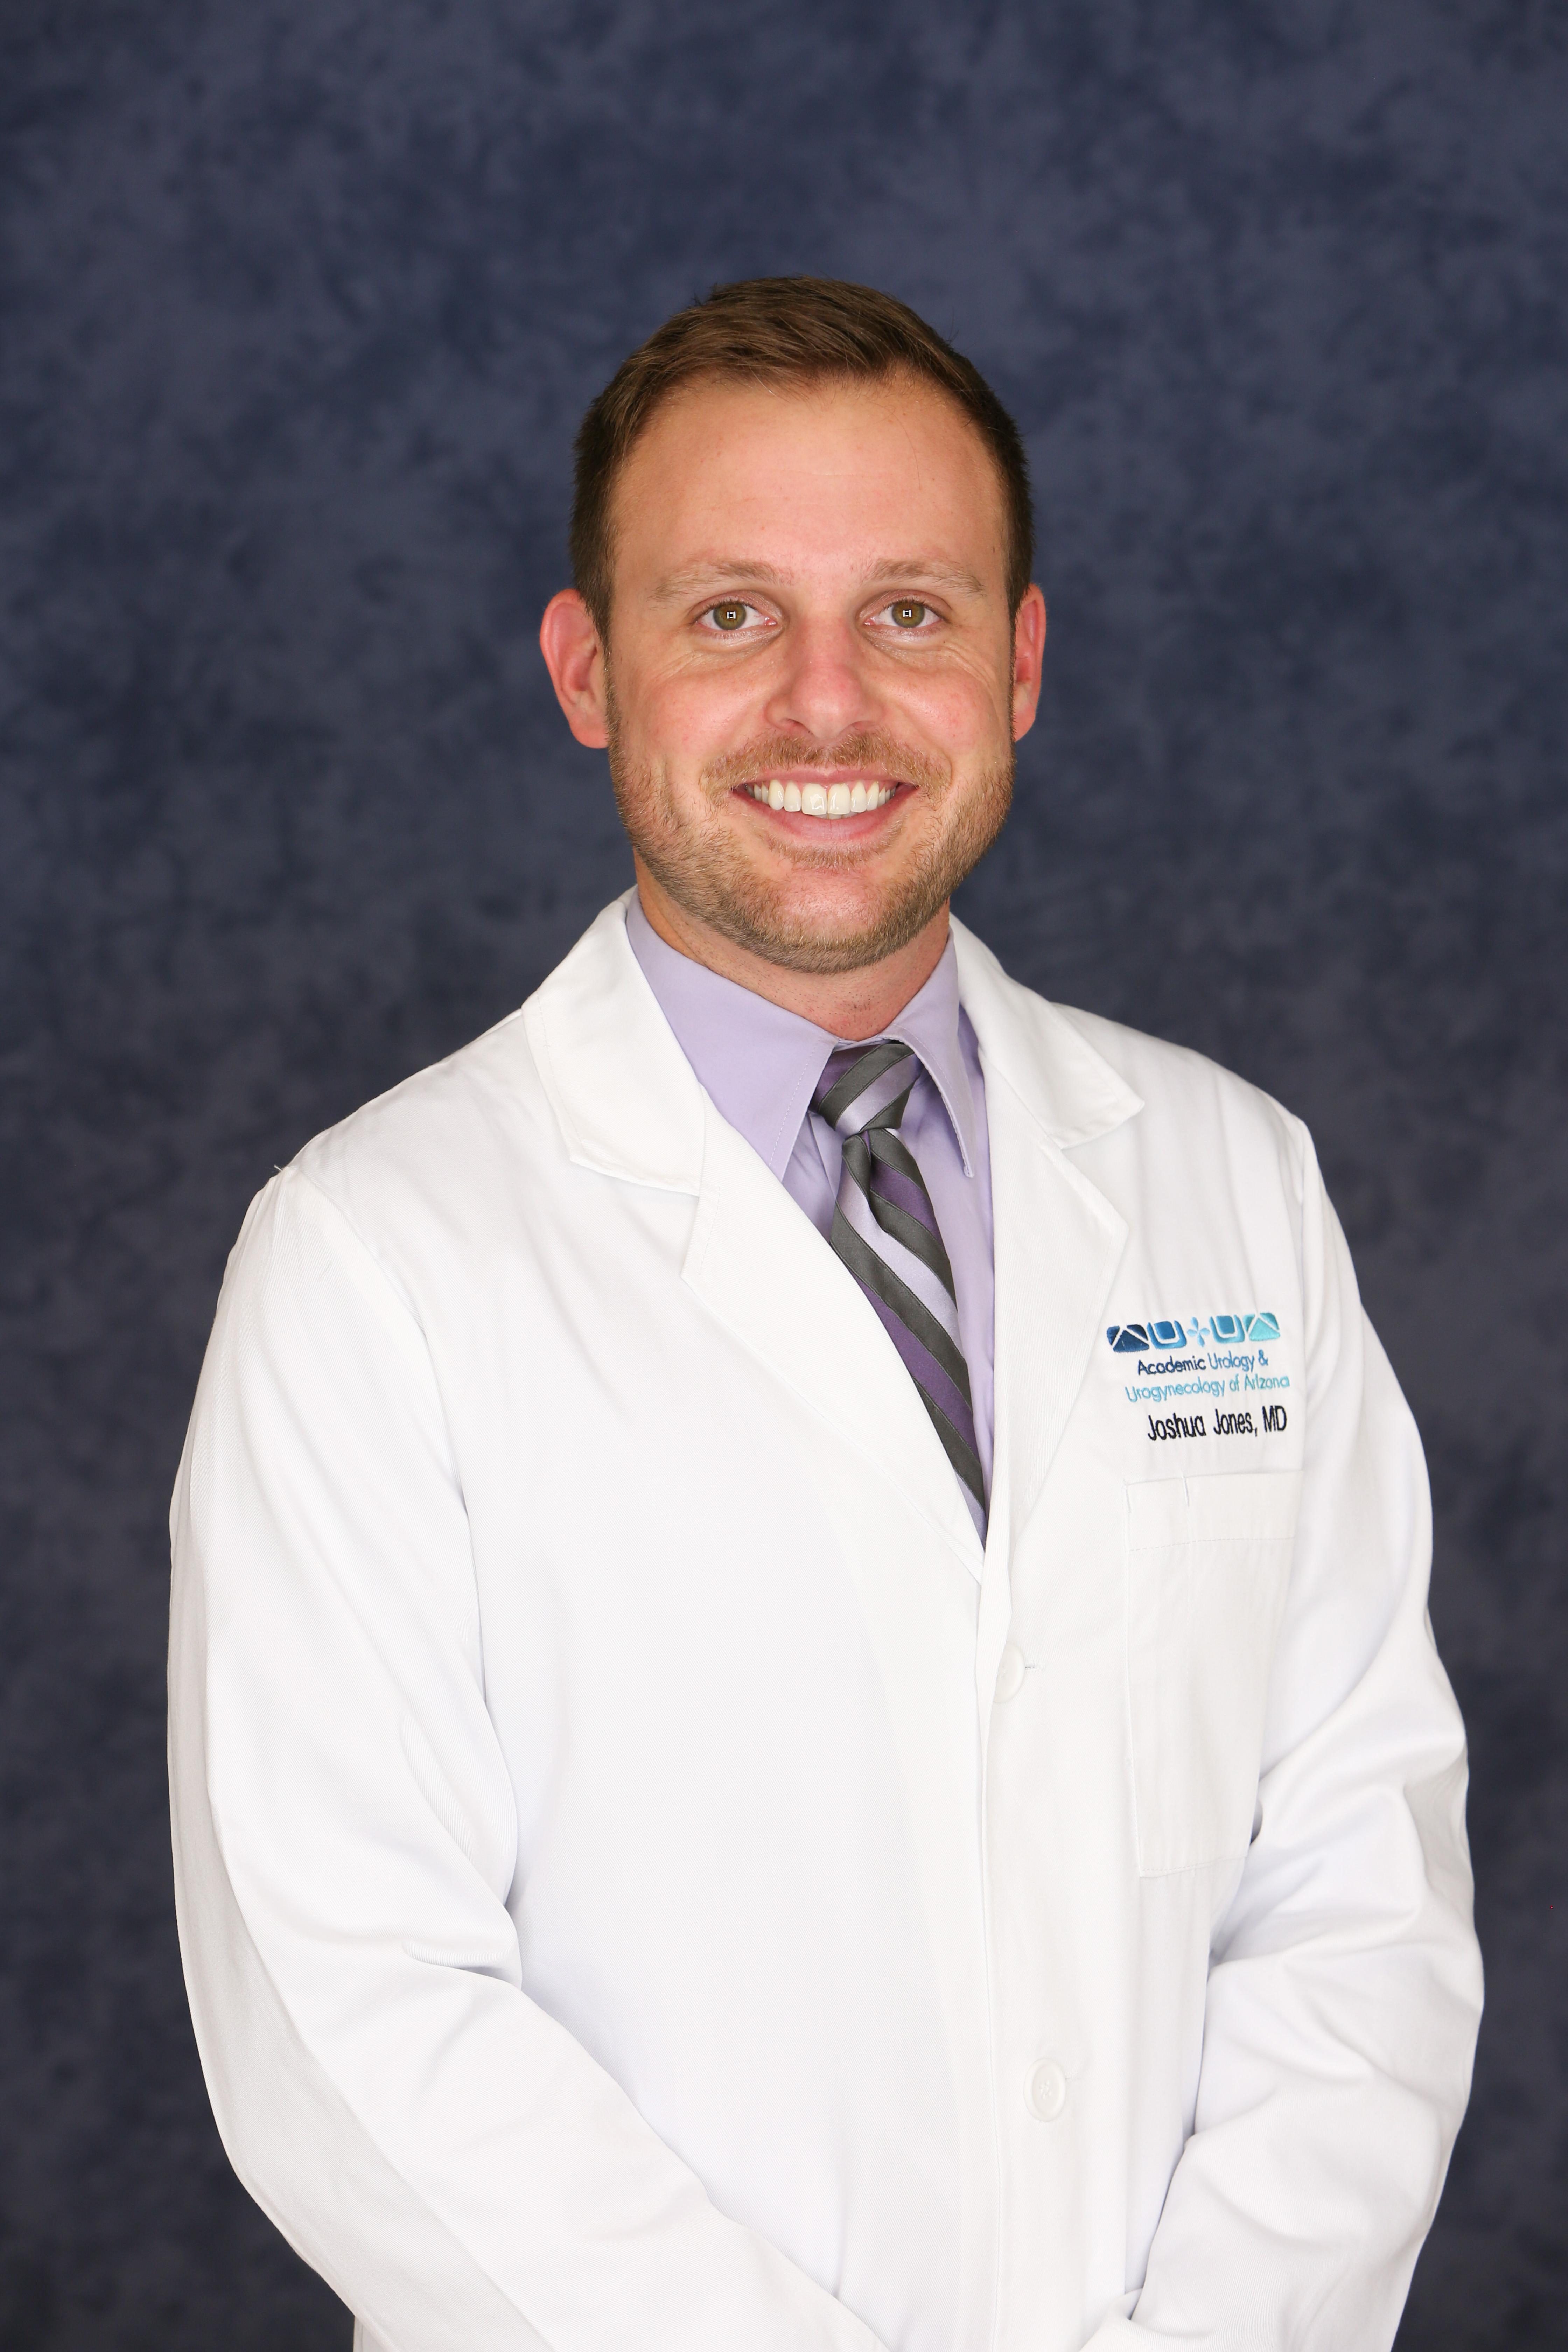 Joshua Jones, MD